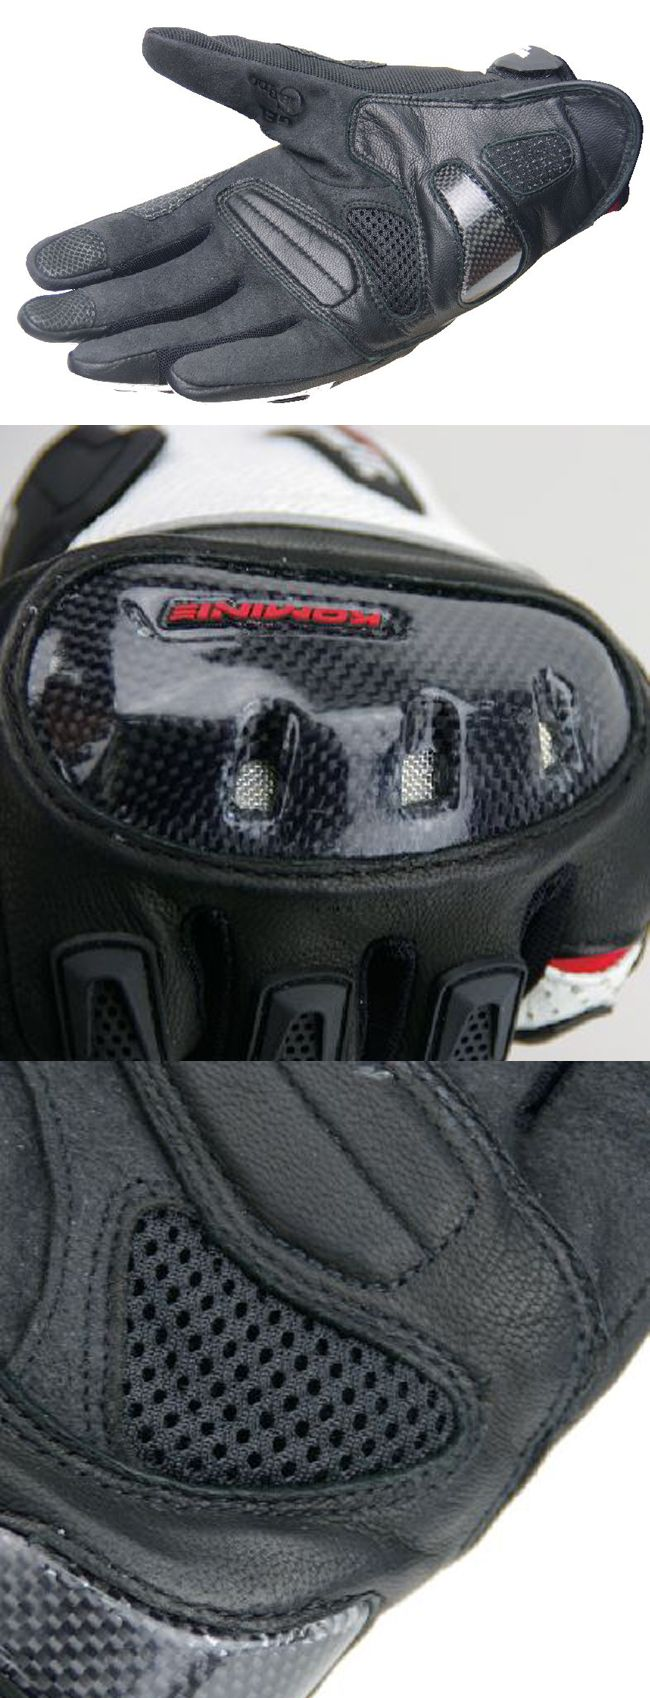 【KOMINE】GK-143 超合身碳纖維網格手套 Delos - 「Webike-摩托百貨」